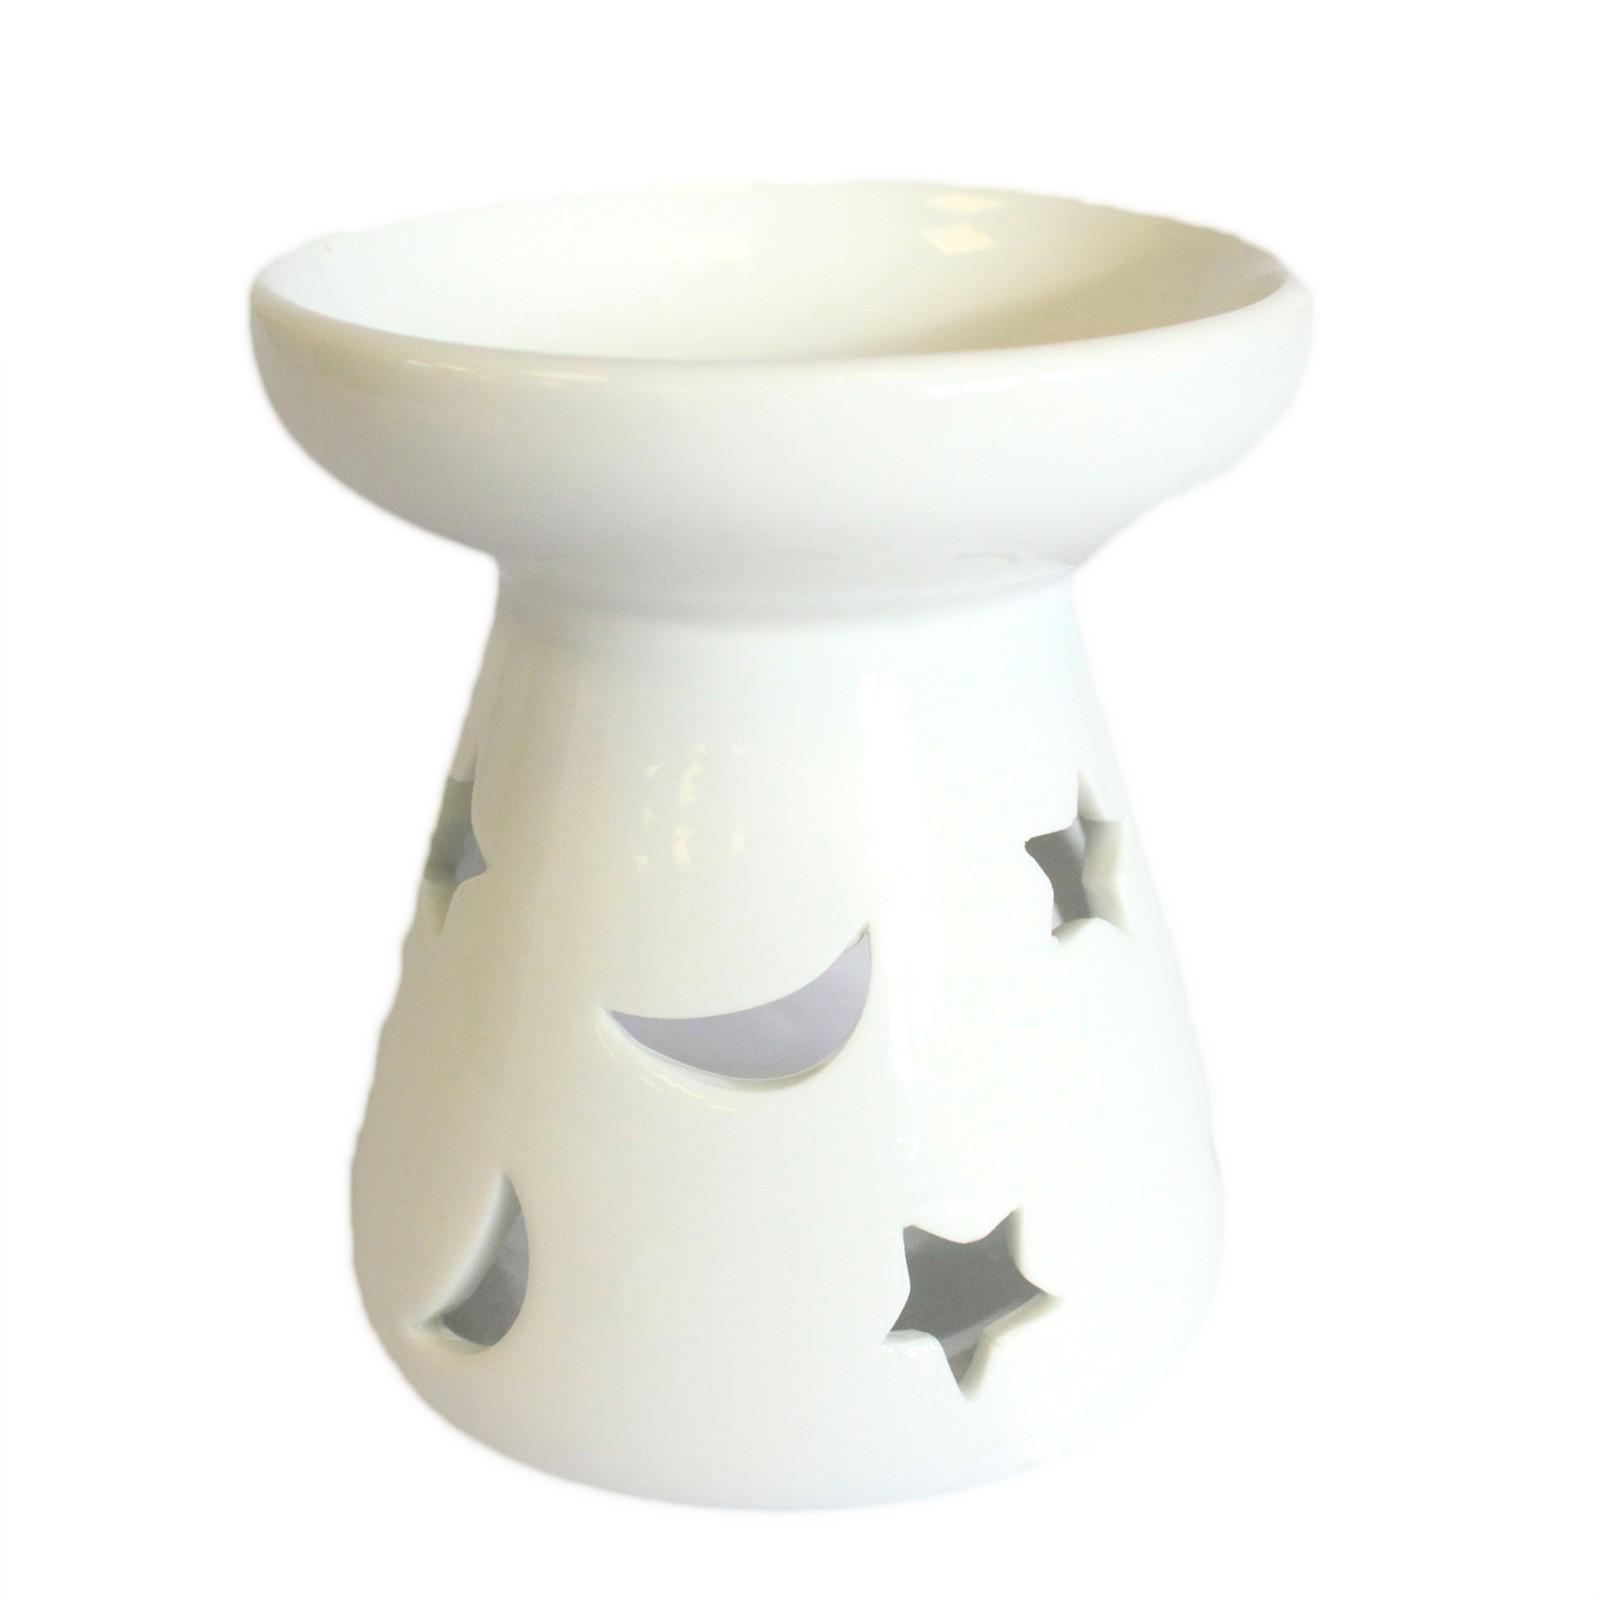 Lrg Classic White Oil Burner Moon and Star